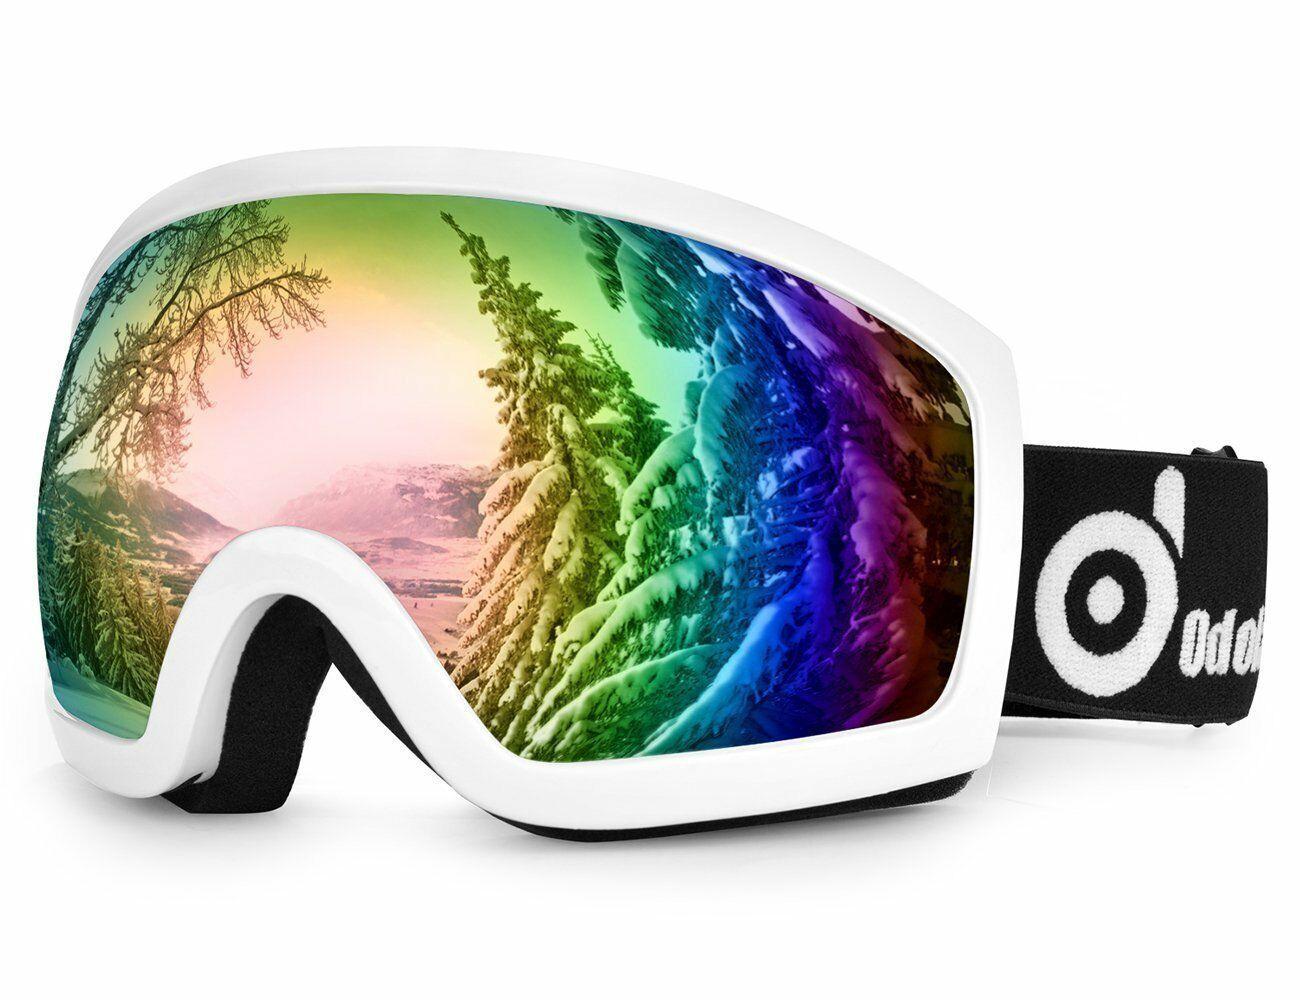 Snow Ski Goggles Unisex Anti Fog Windproof UV400